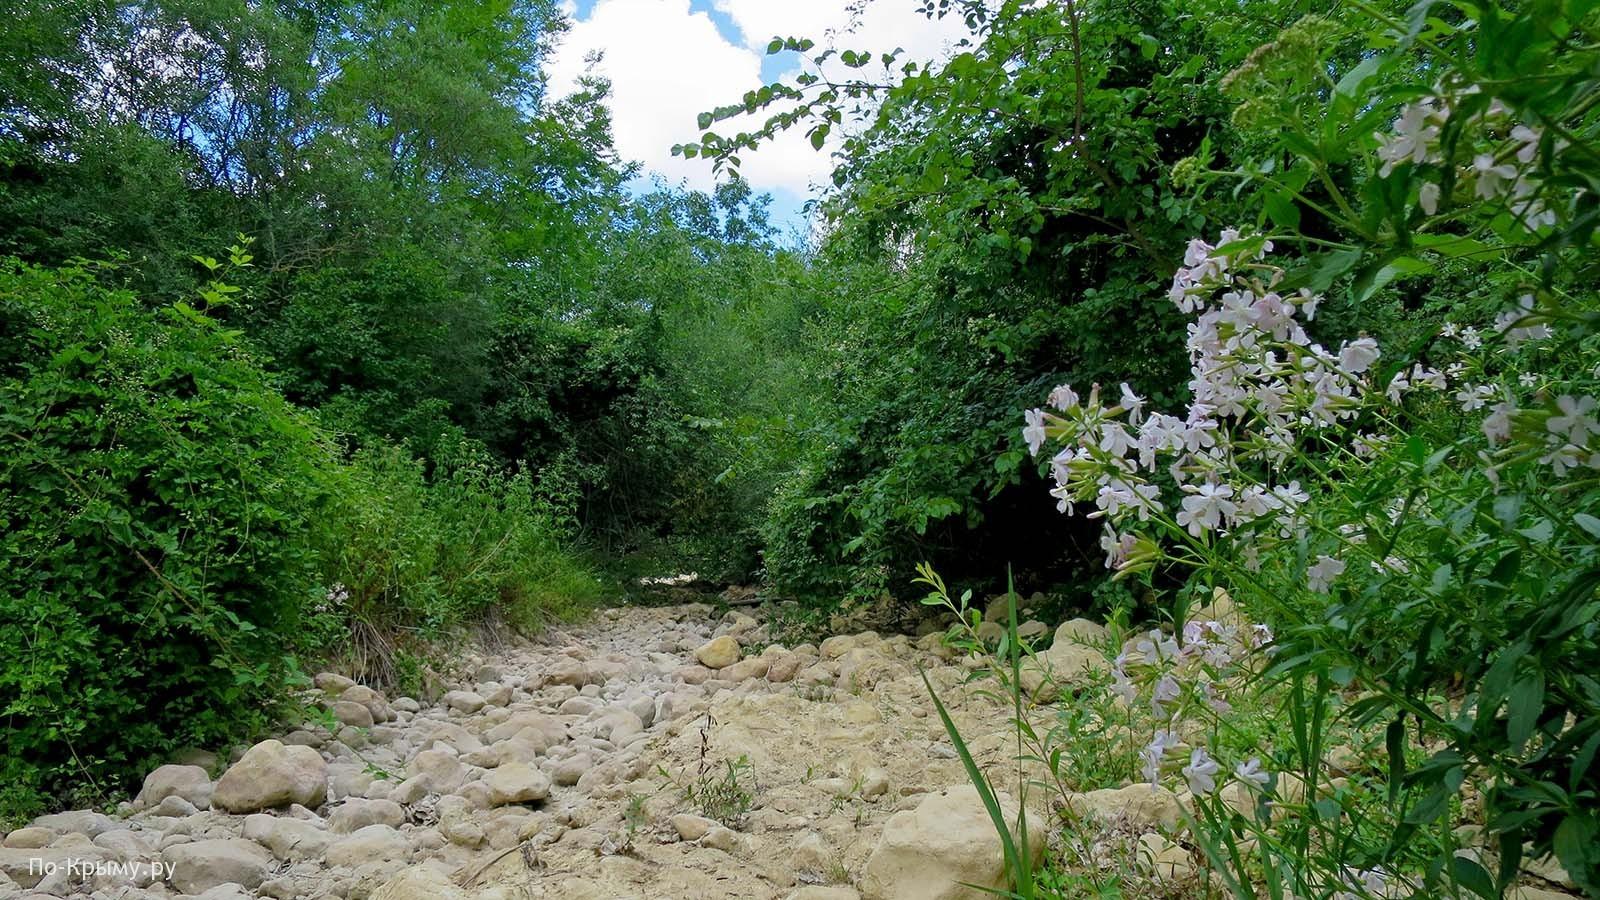 Крым, каньон Узунджа - река летом пересыхает